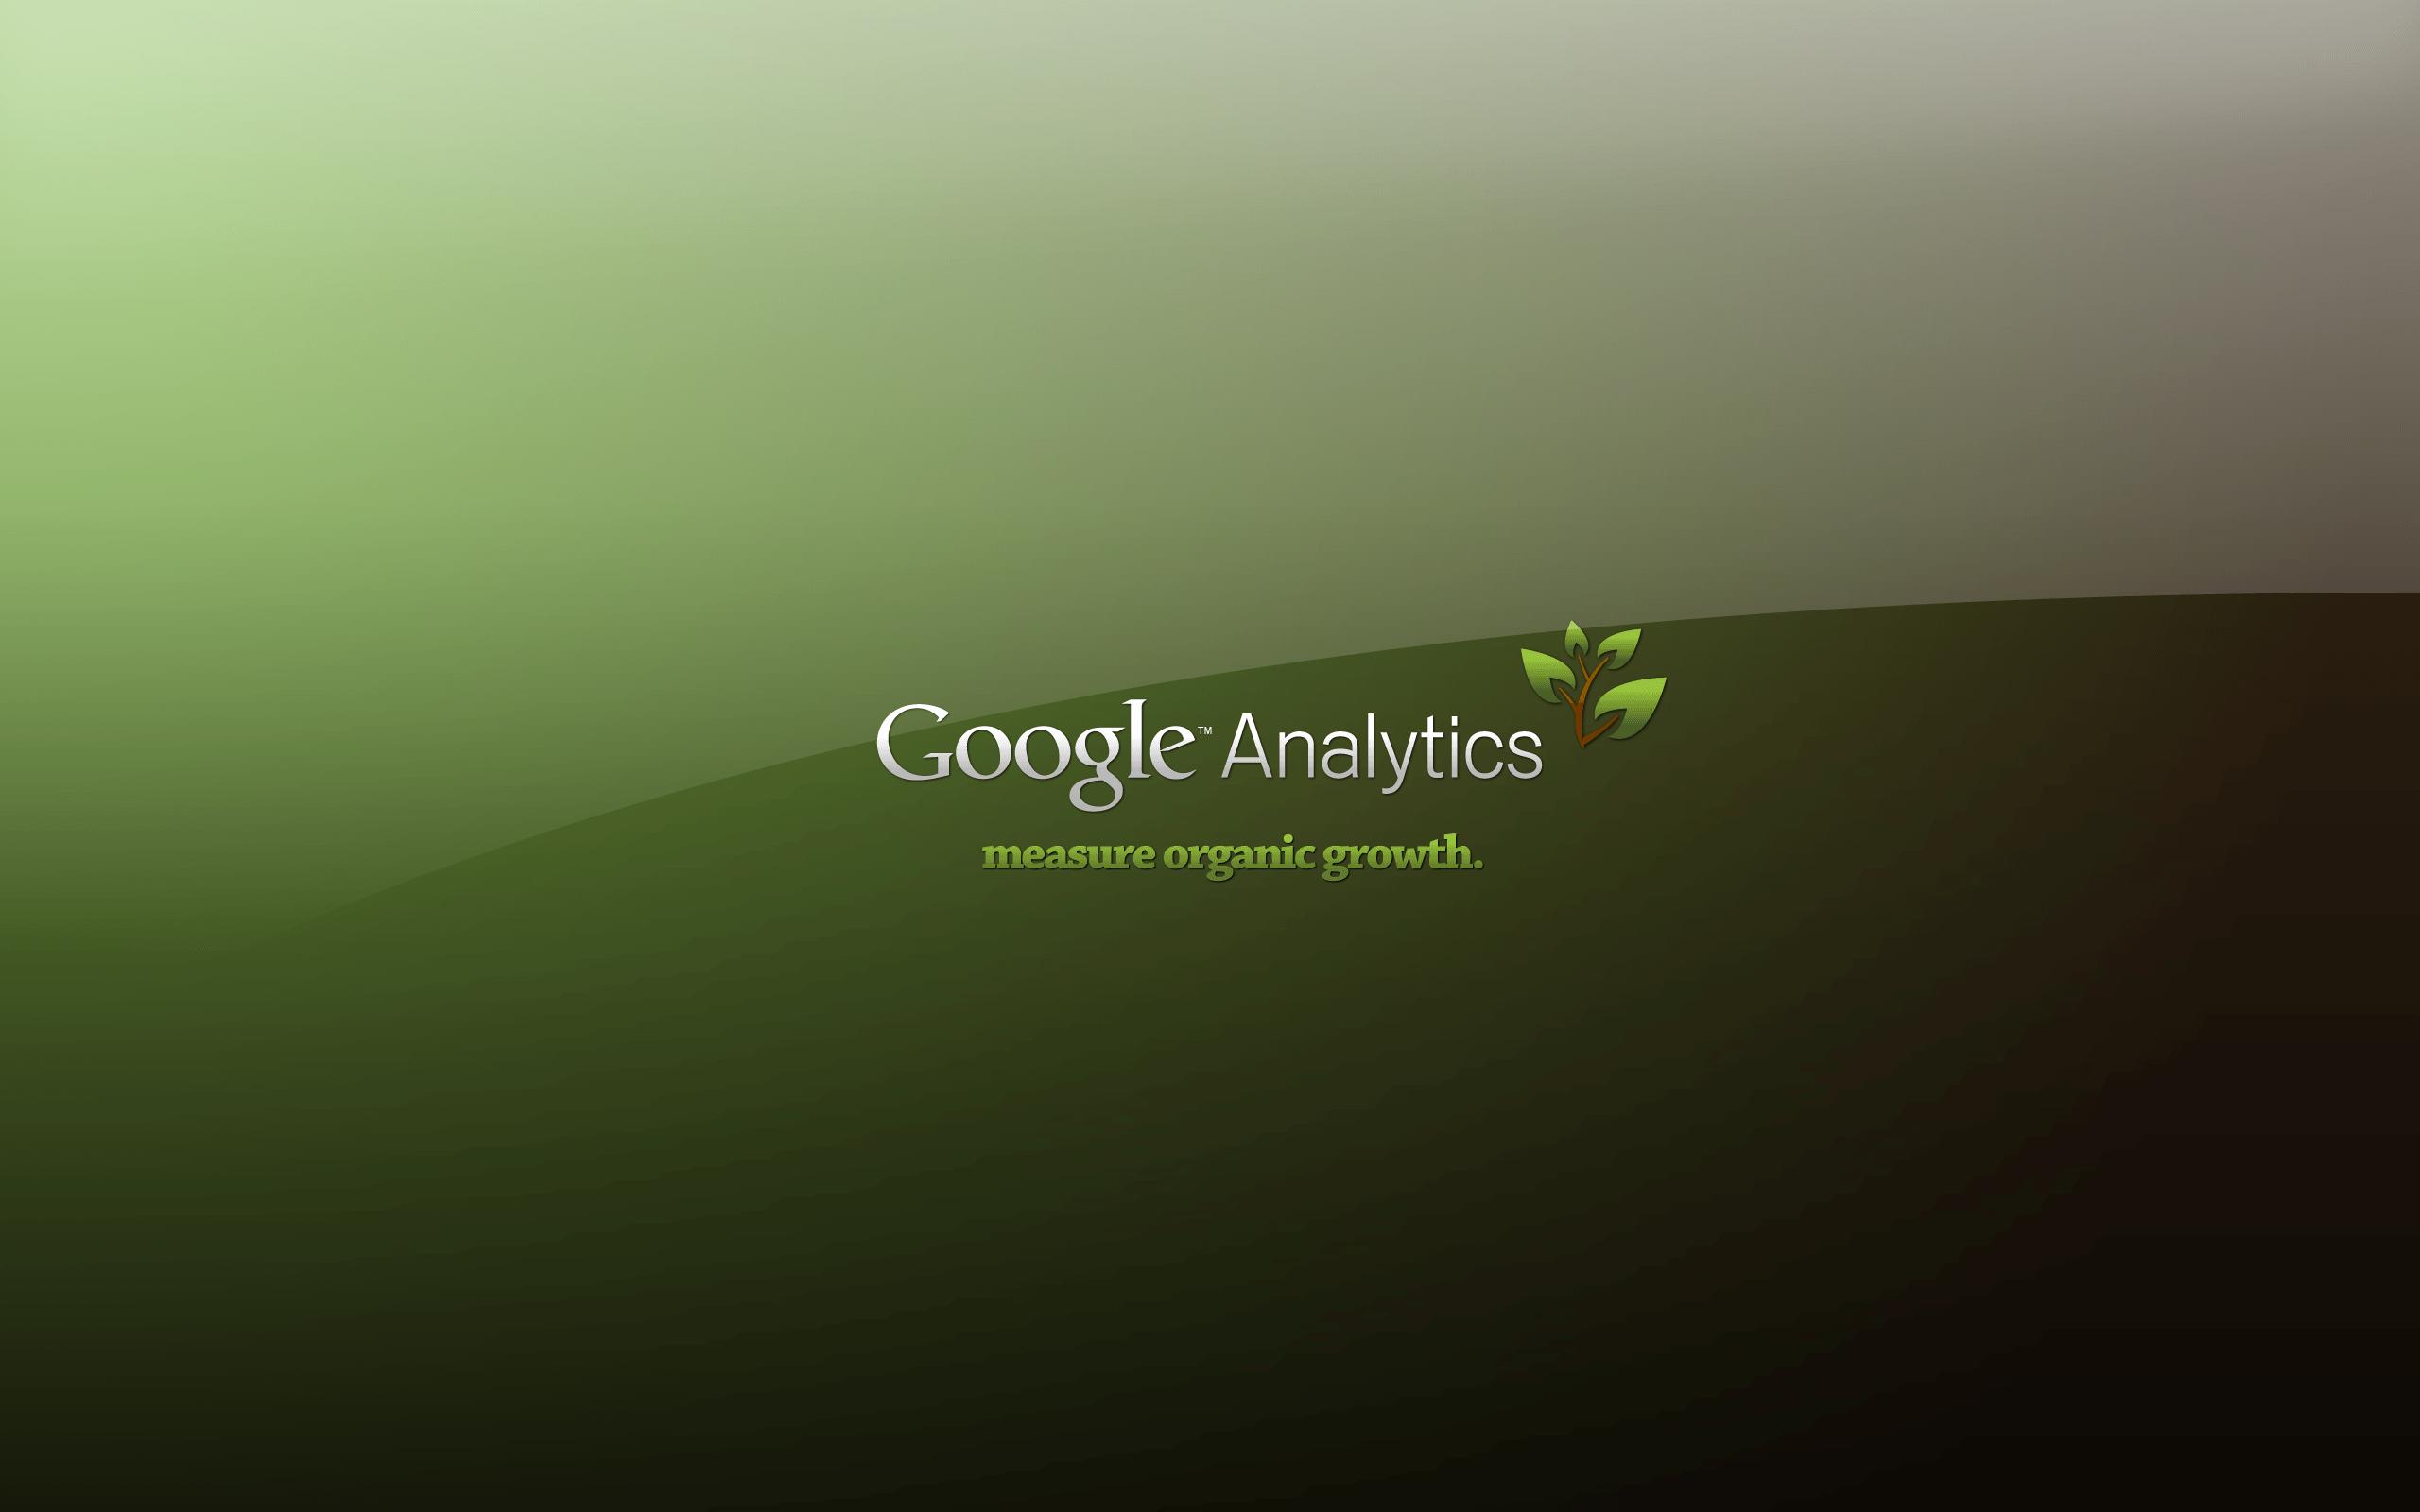 Google Hd Wallpapers Wallpaper Cave